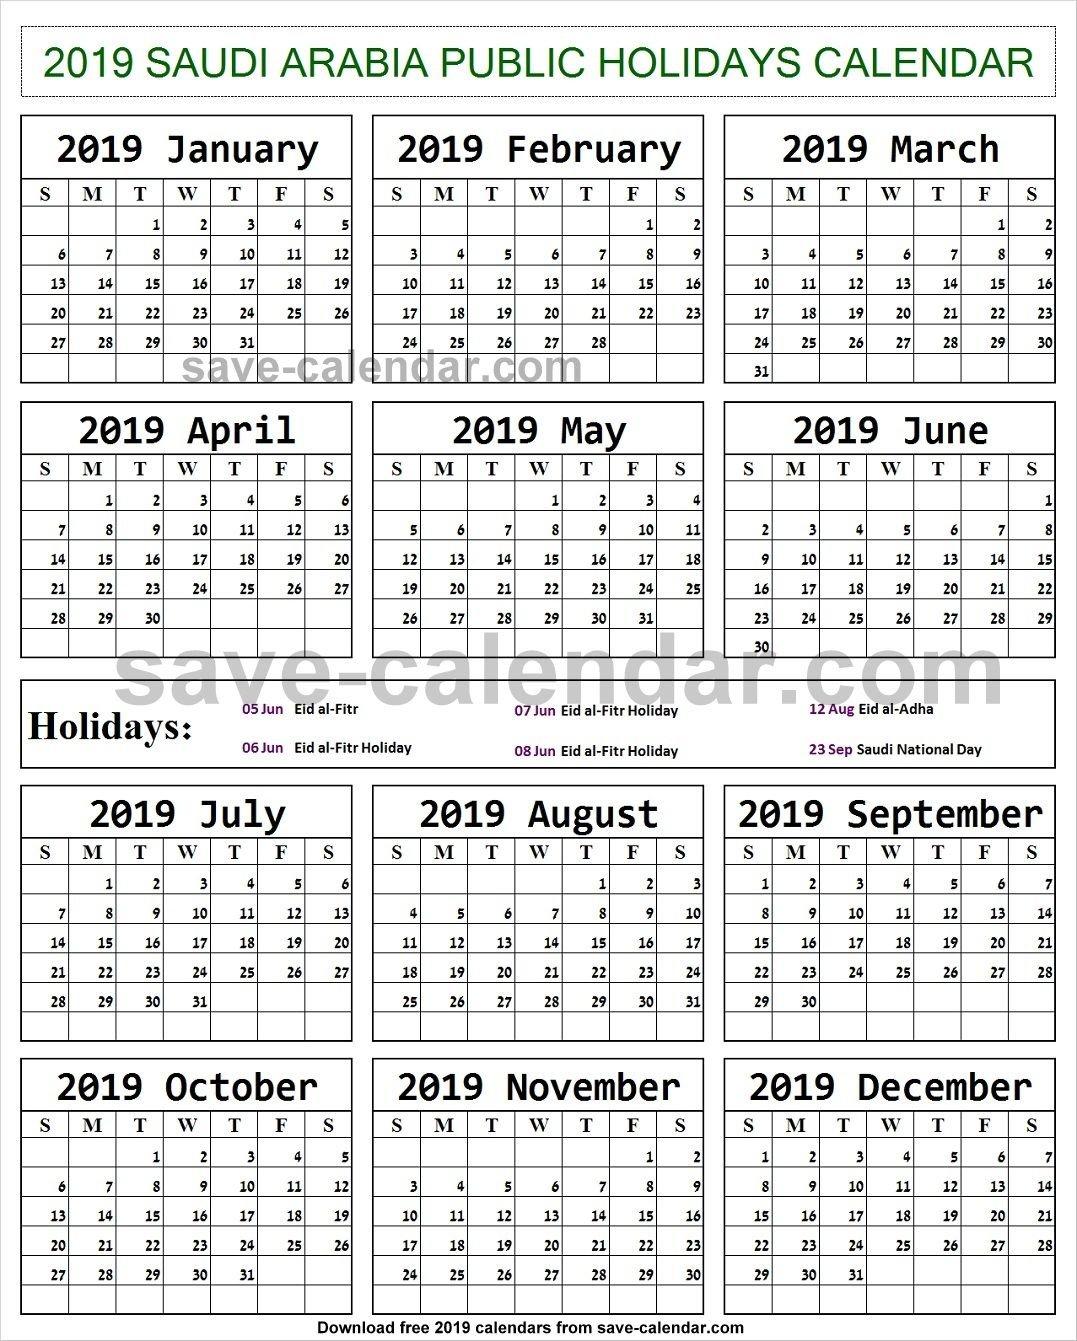 2019 Calendar Holidays Saudi Arabia Printable | Holidays Calendar Calendar 2019 Ksa